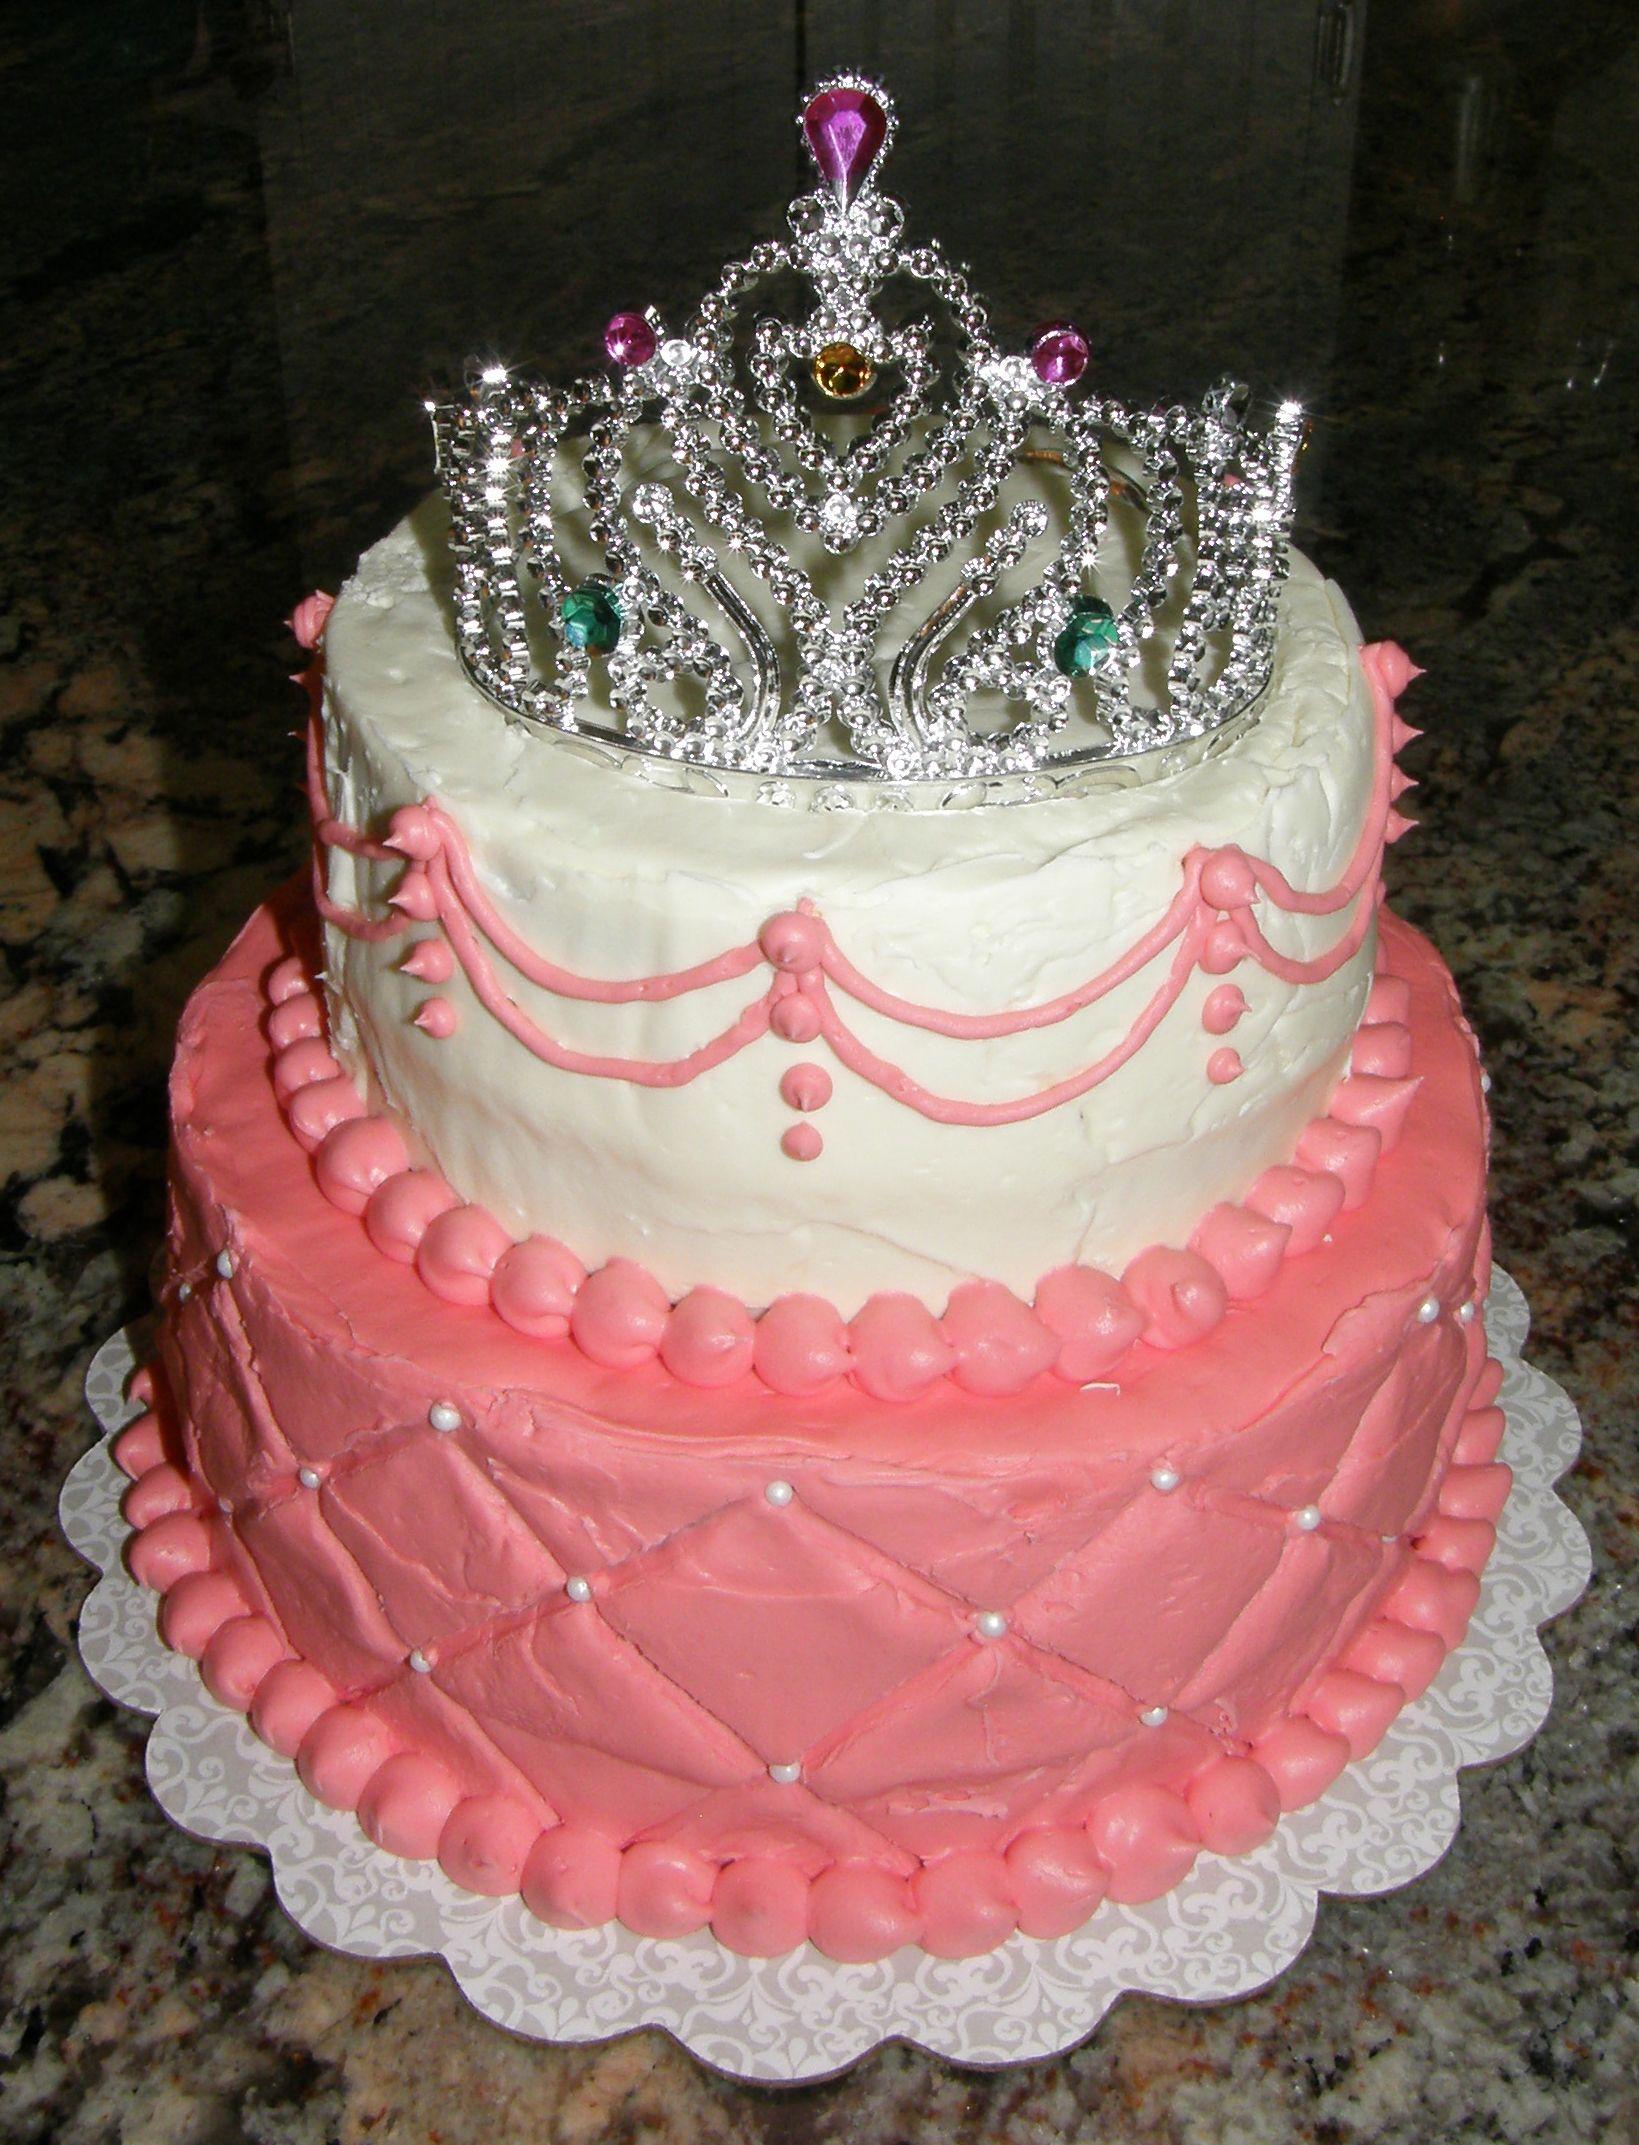 One Of My Favorite Girl Birthday Cake Designs